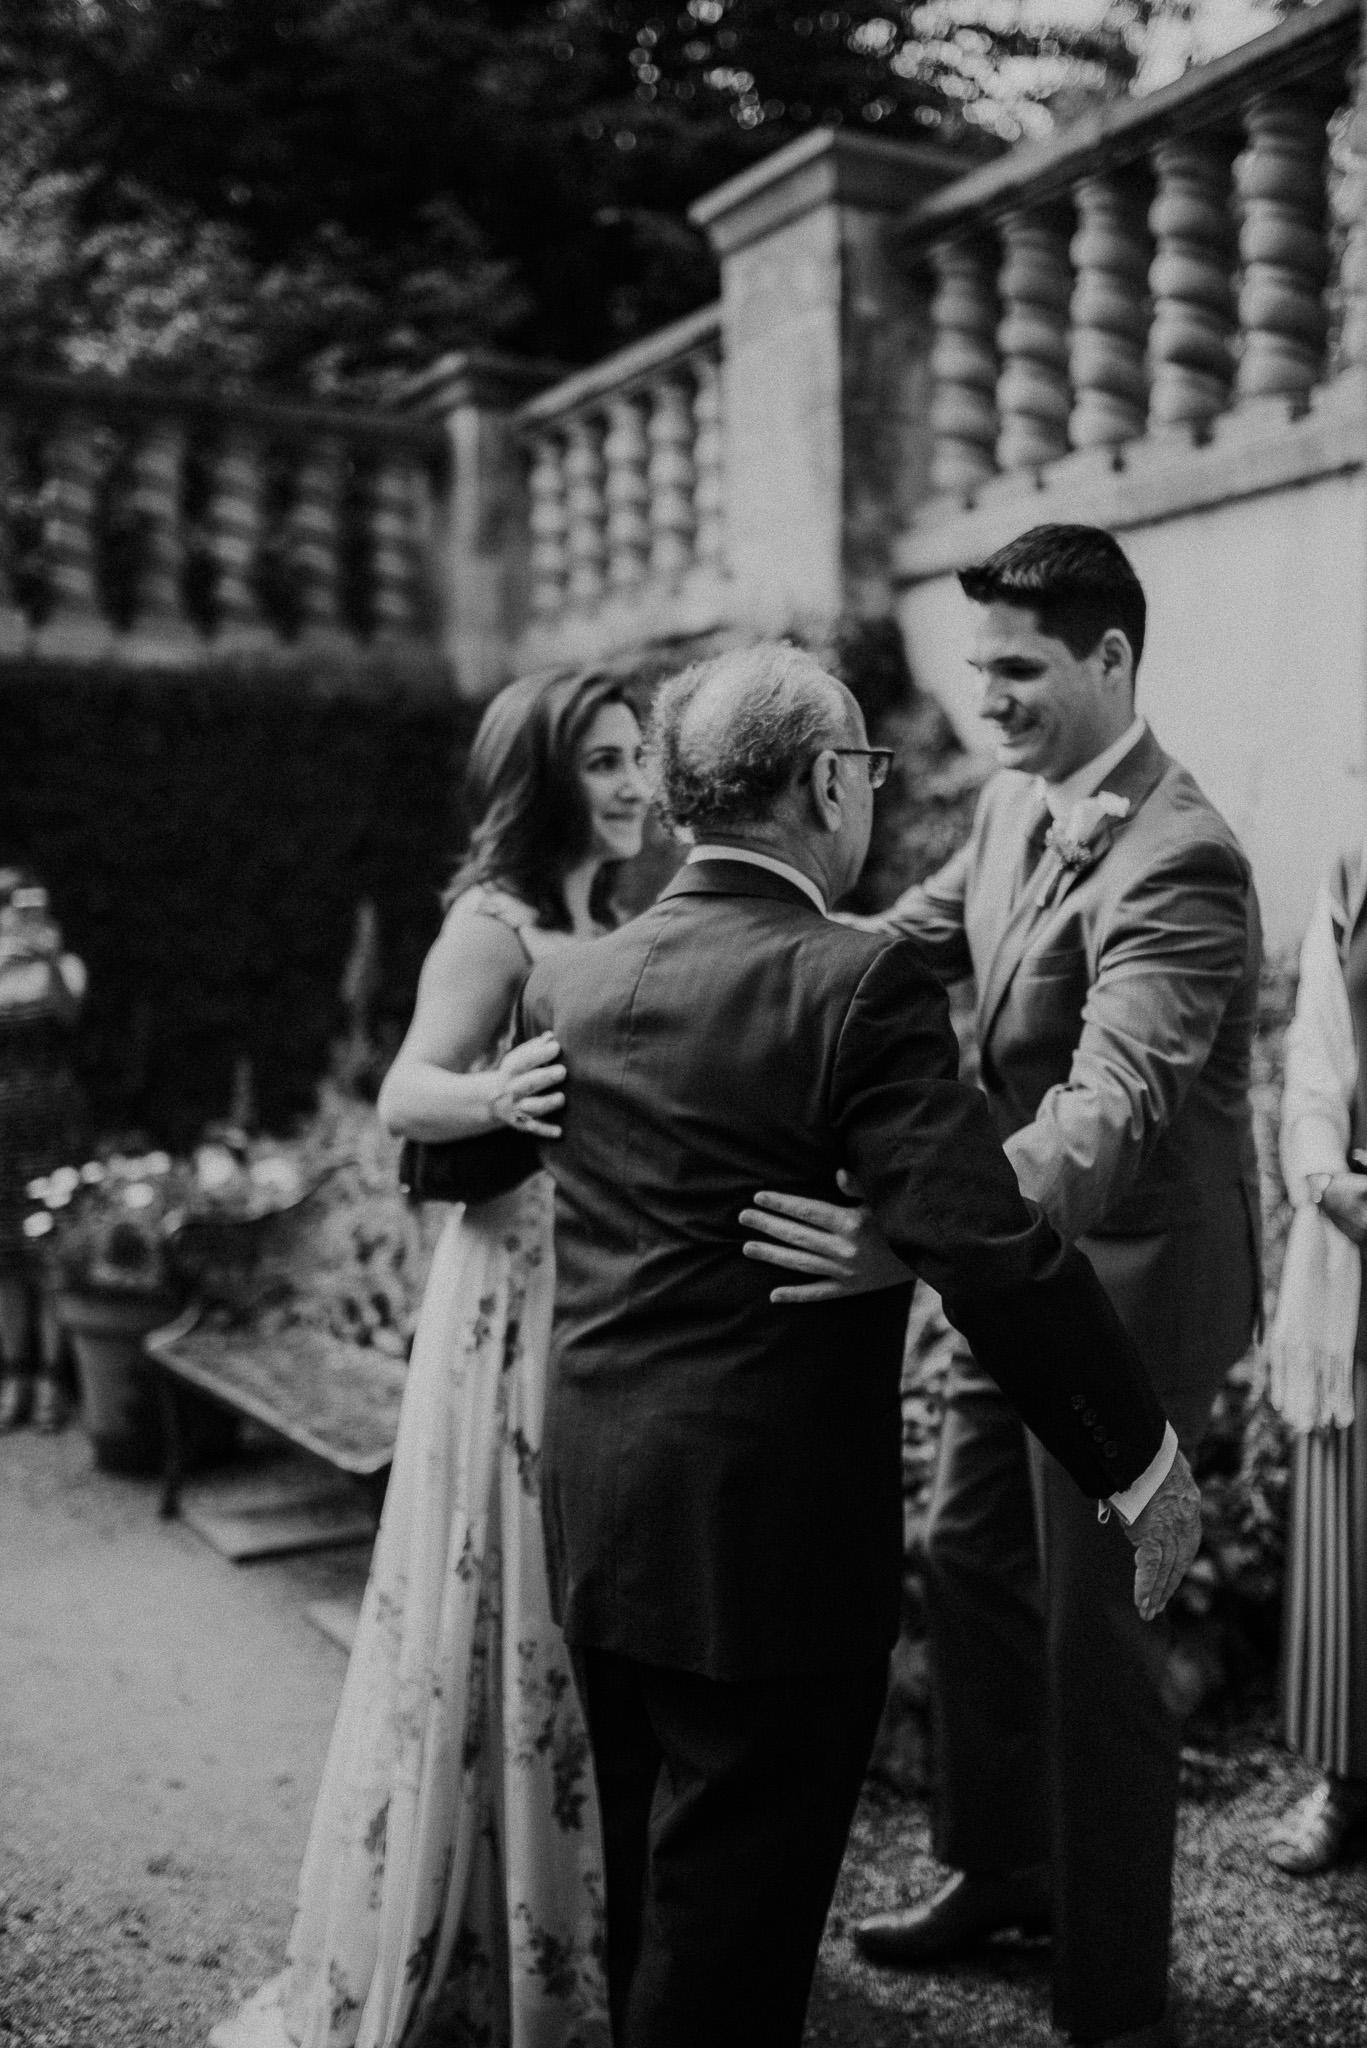 Dallas-fort-worth-wedding-photographer-dallas-arboretum-intimate-wedding-dallas-texas-09